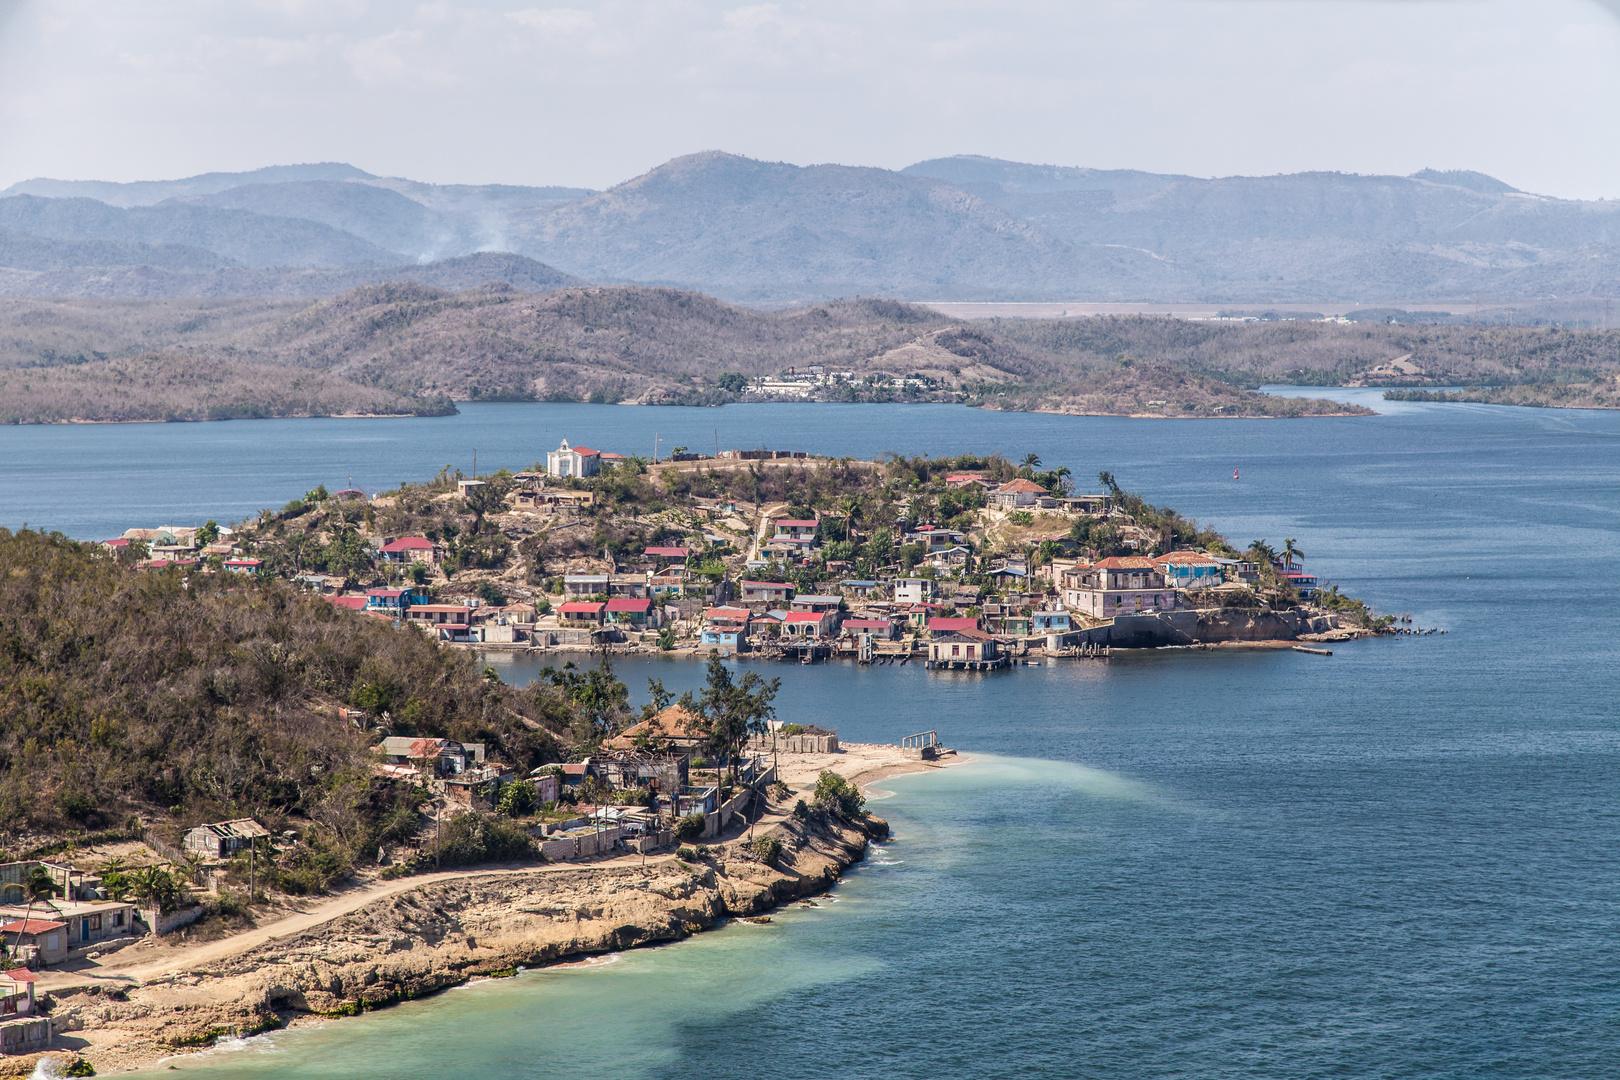 Von der Festung in Santiago de Cuba